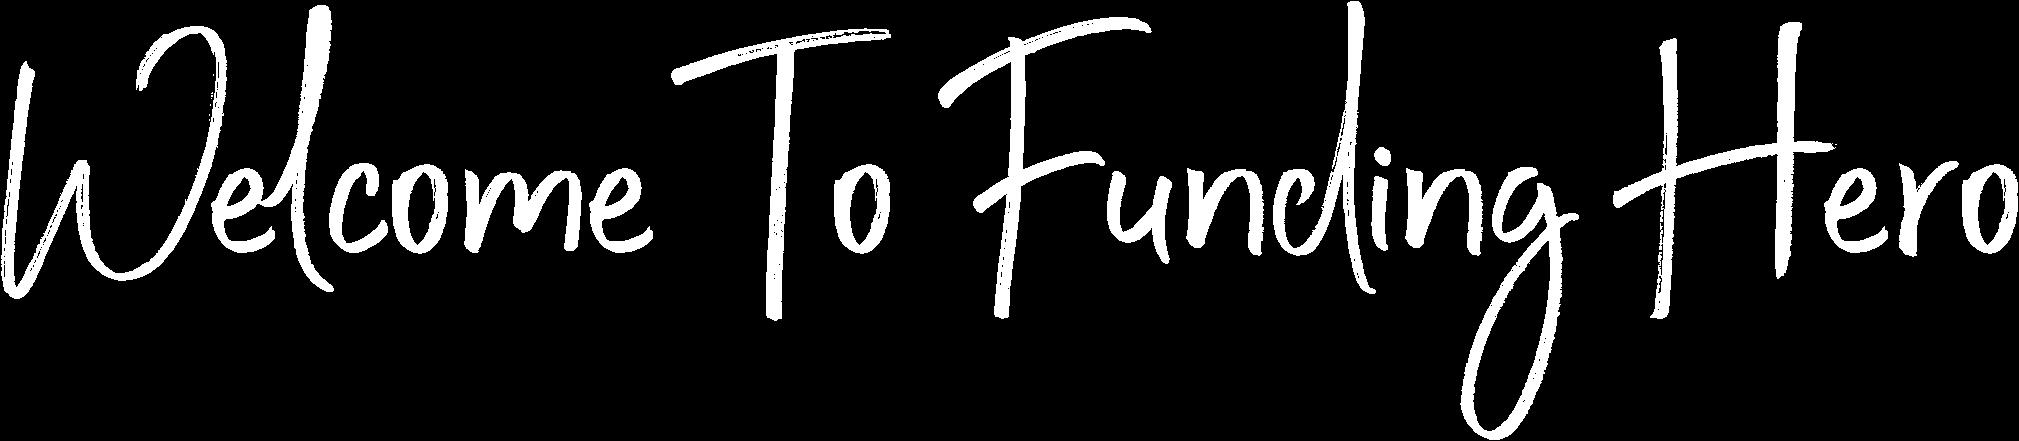 fundinghero.com image